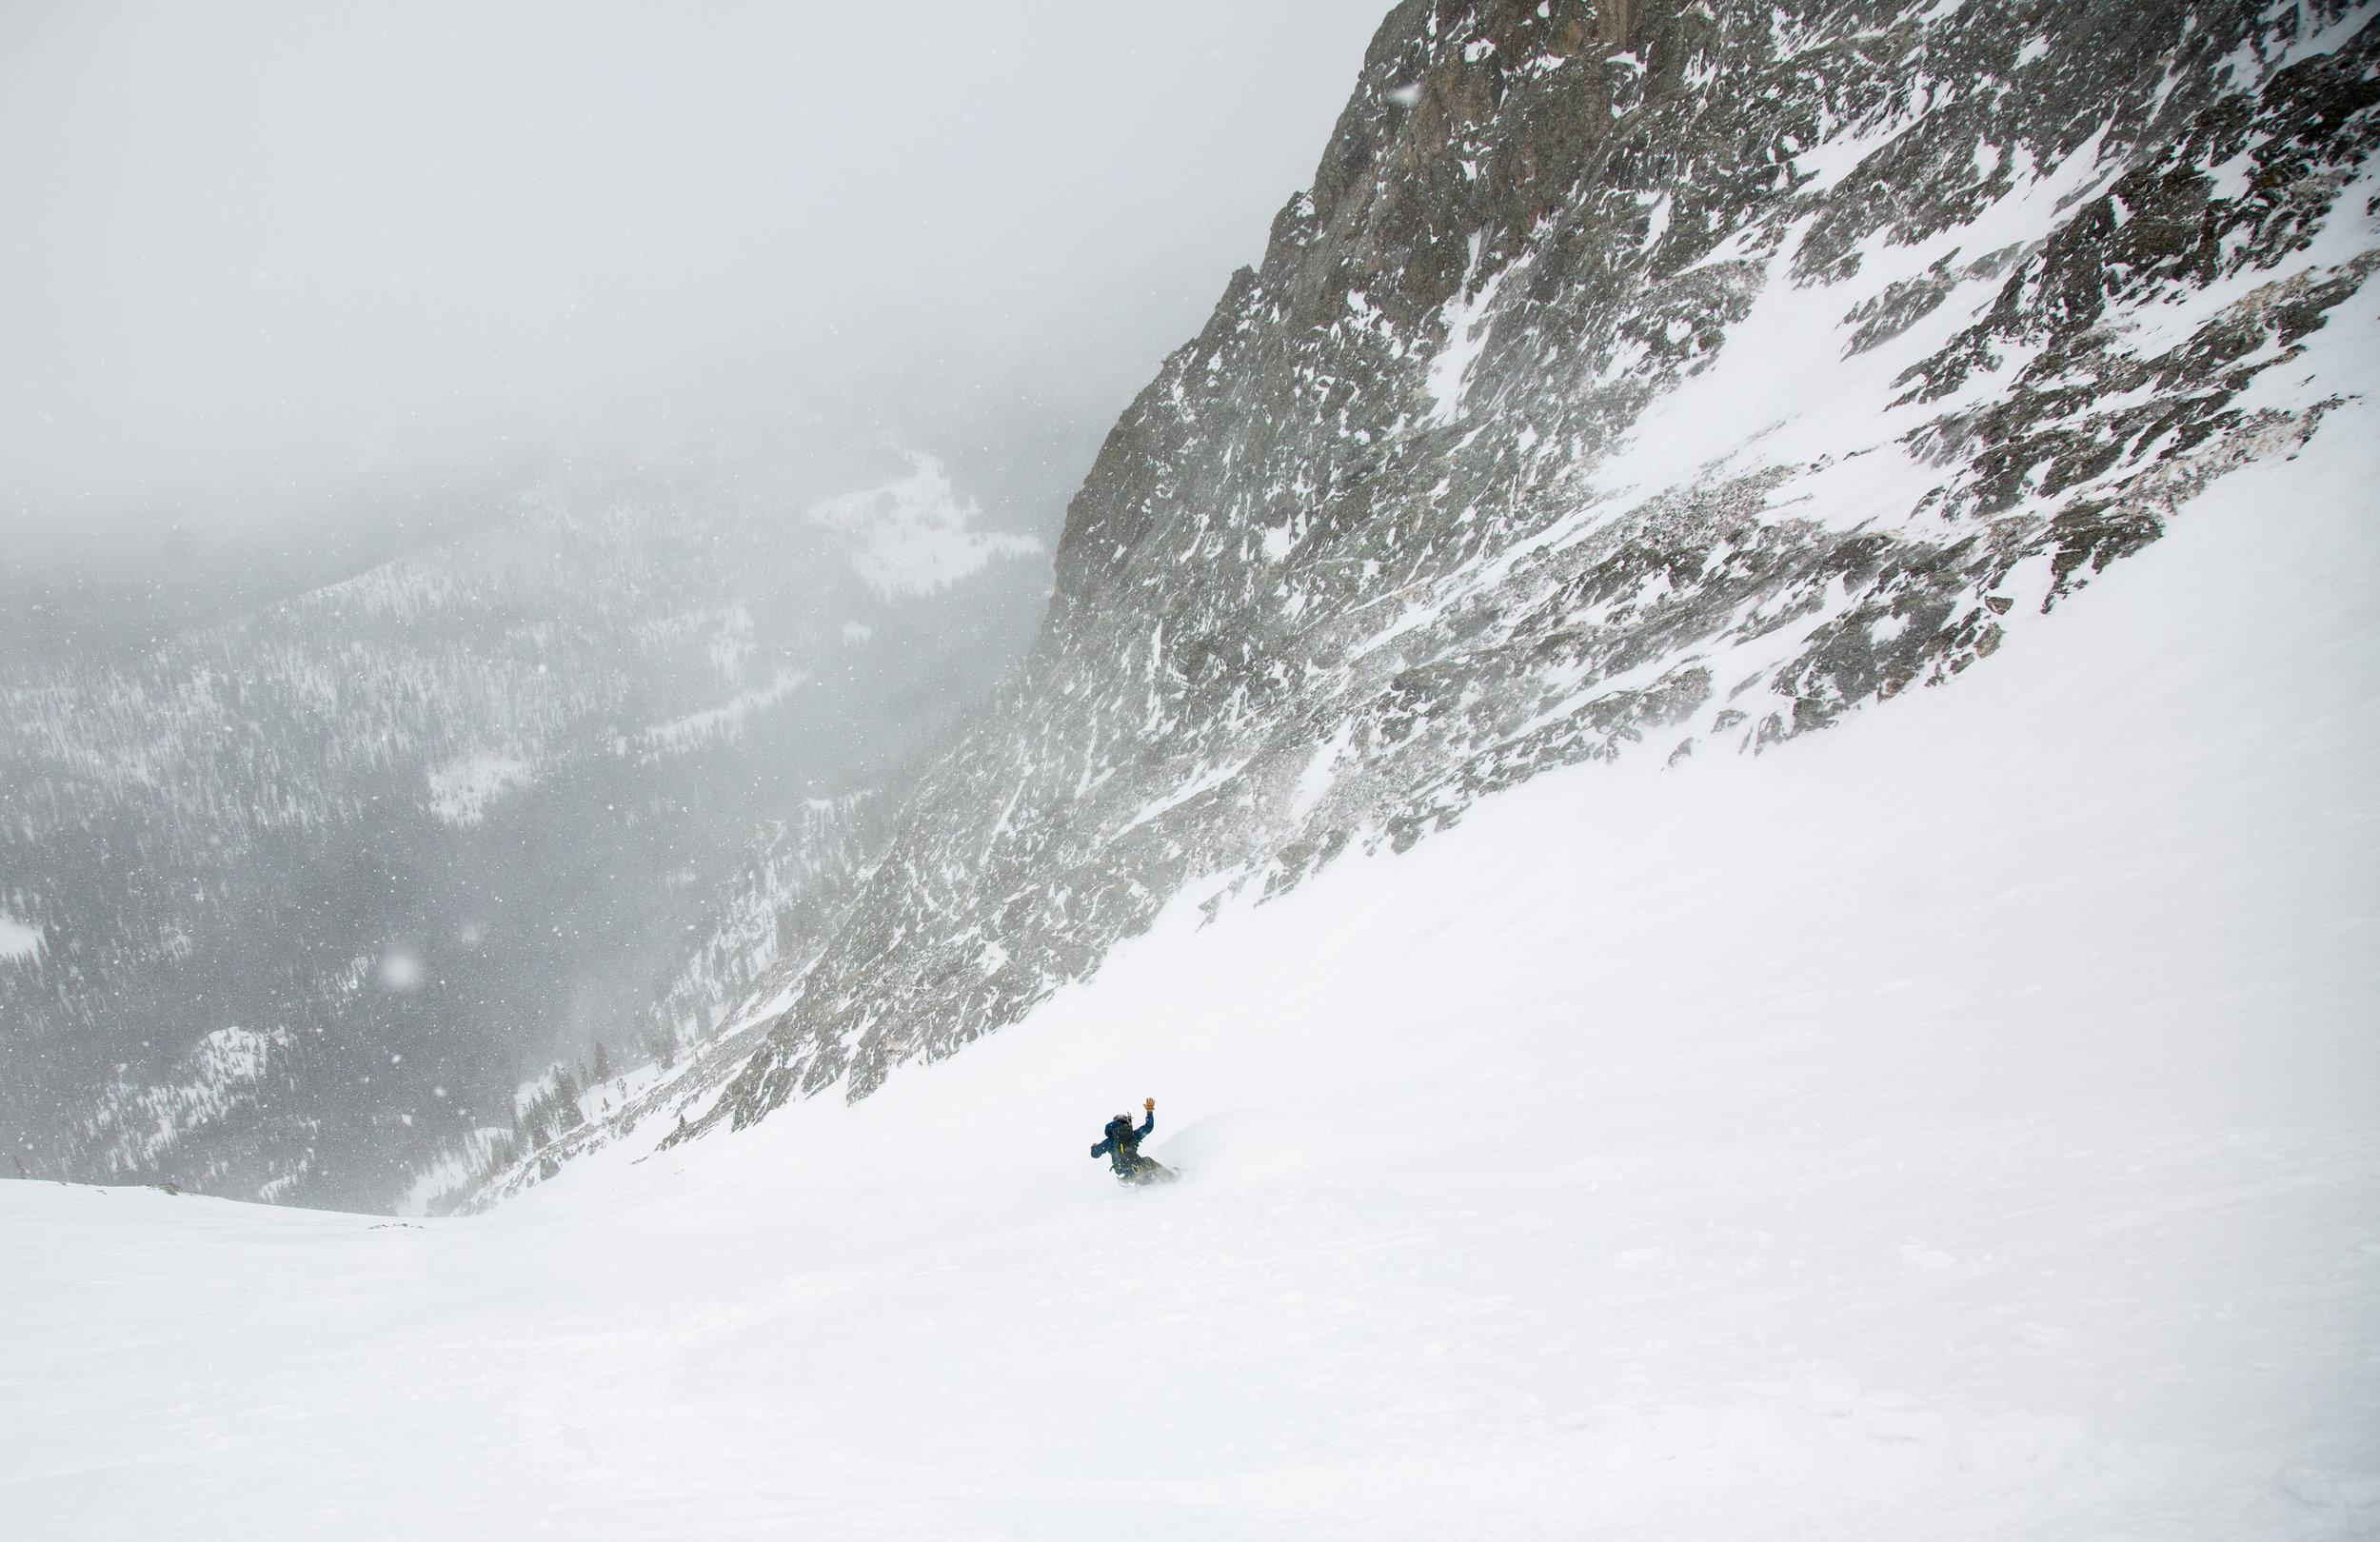 JTG_Skiing-11.jpg